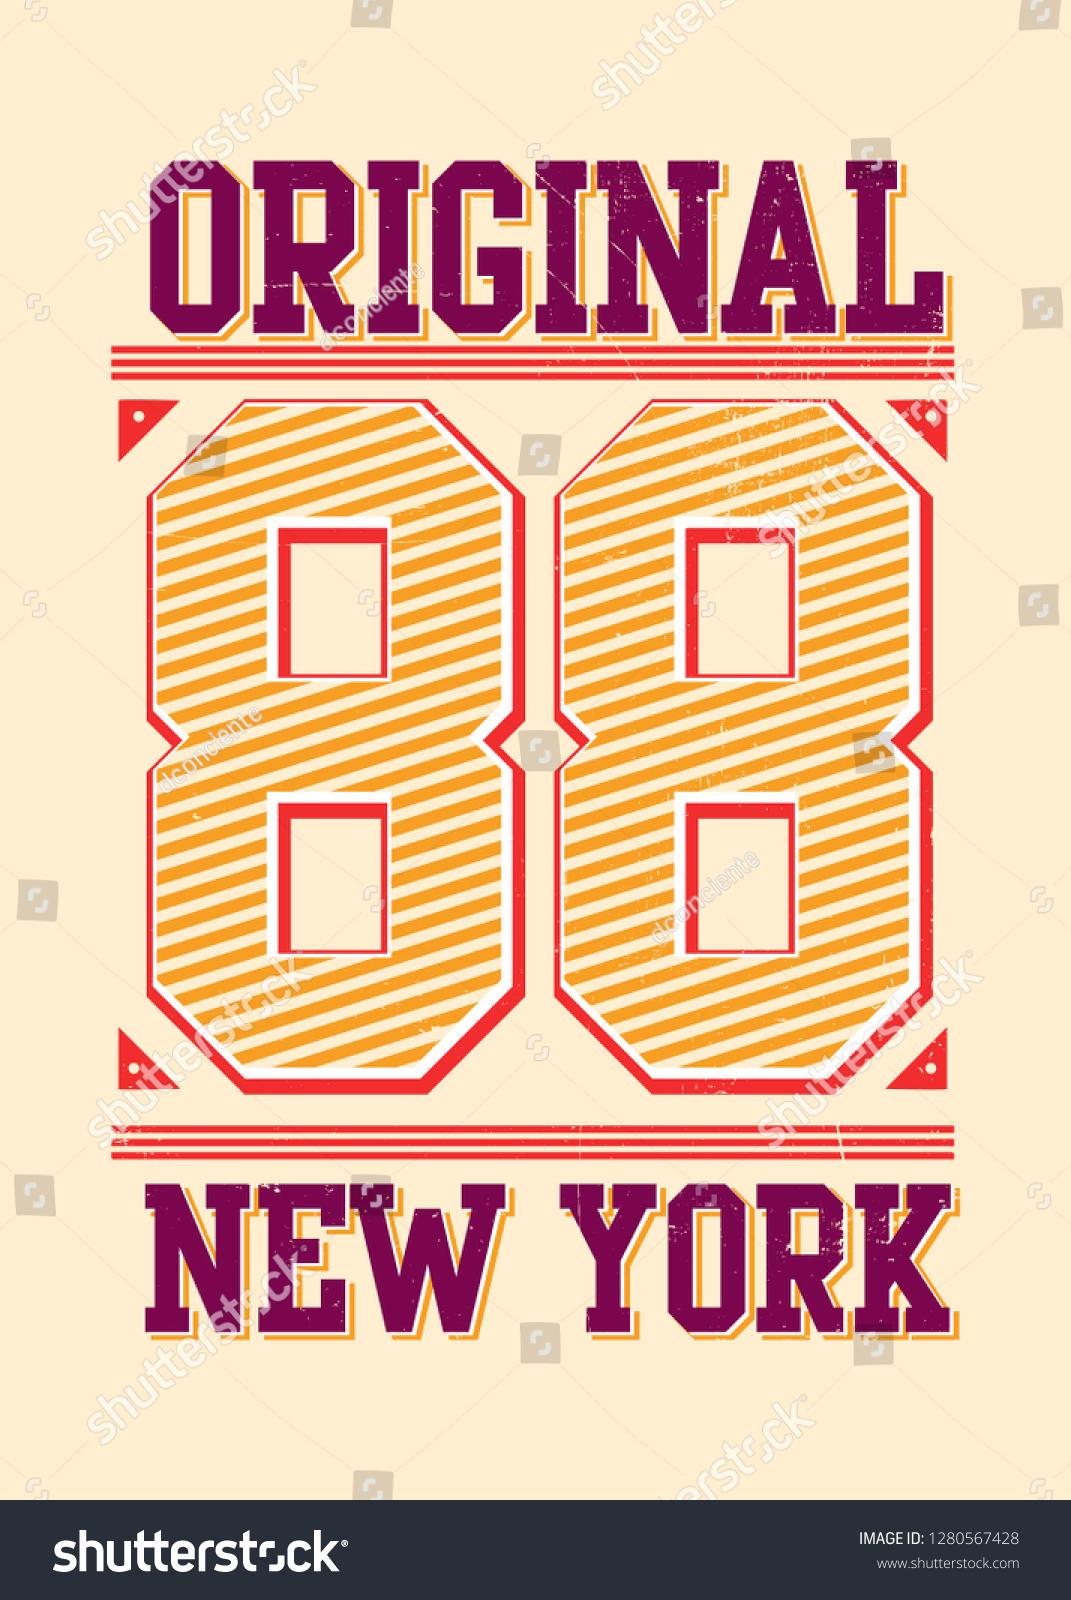 0f700f37 Varsity New York Urban Kids Apparel Stock Vector (Royalty Free ...